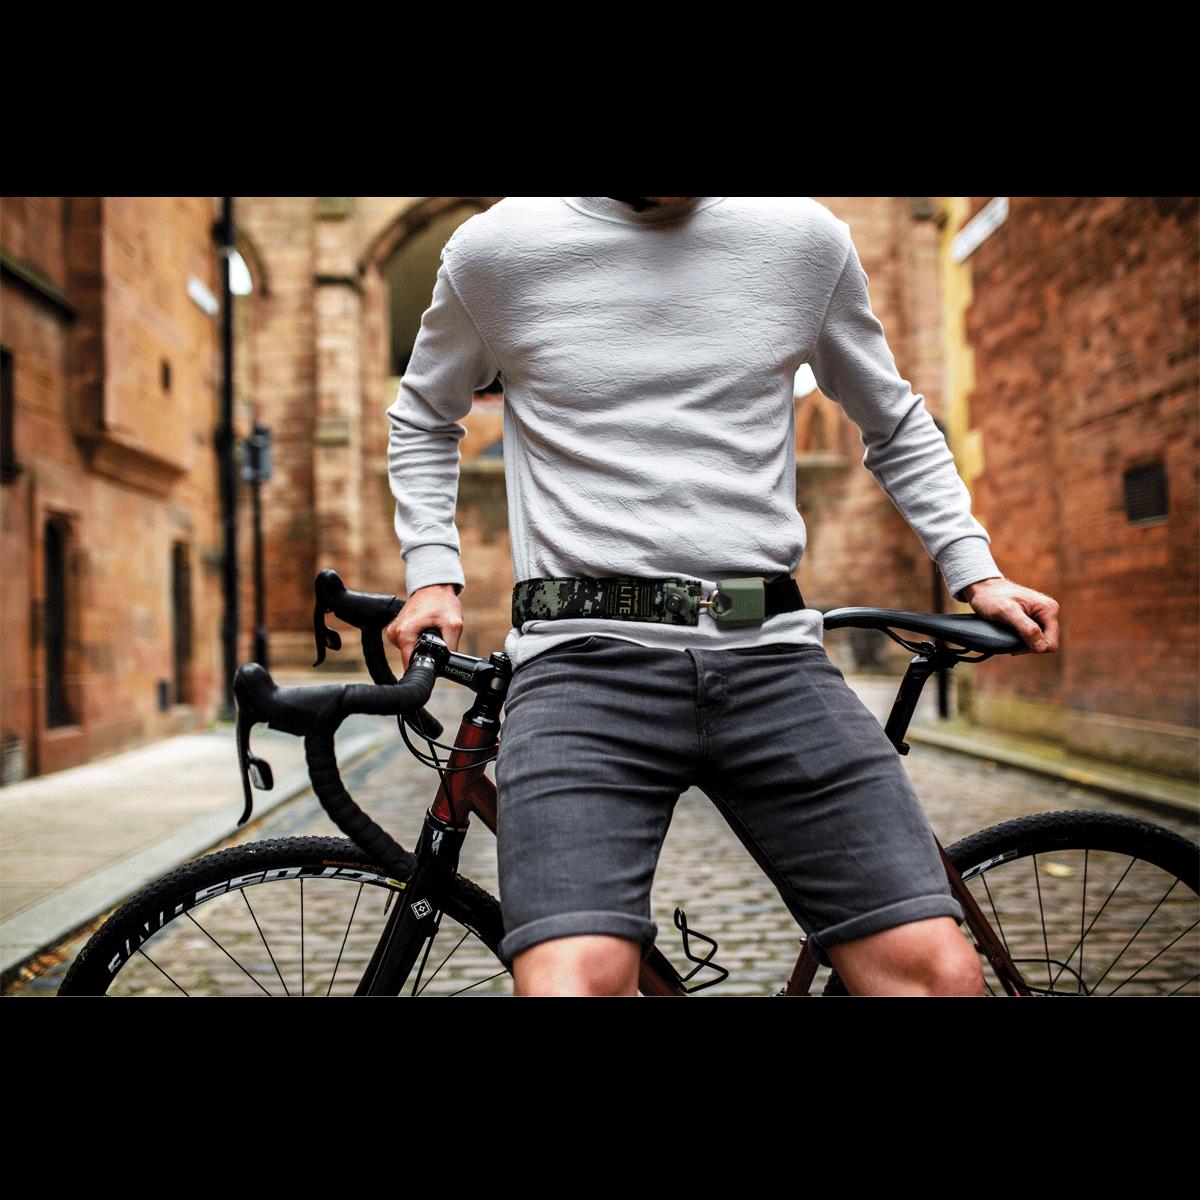 Bicycle Lock Hiplok Chain Lite Key 6mm x 75cm Black